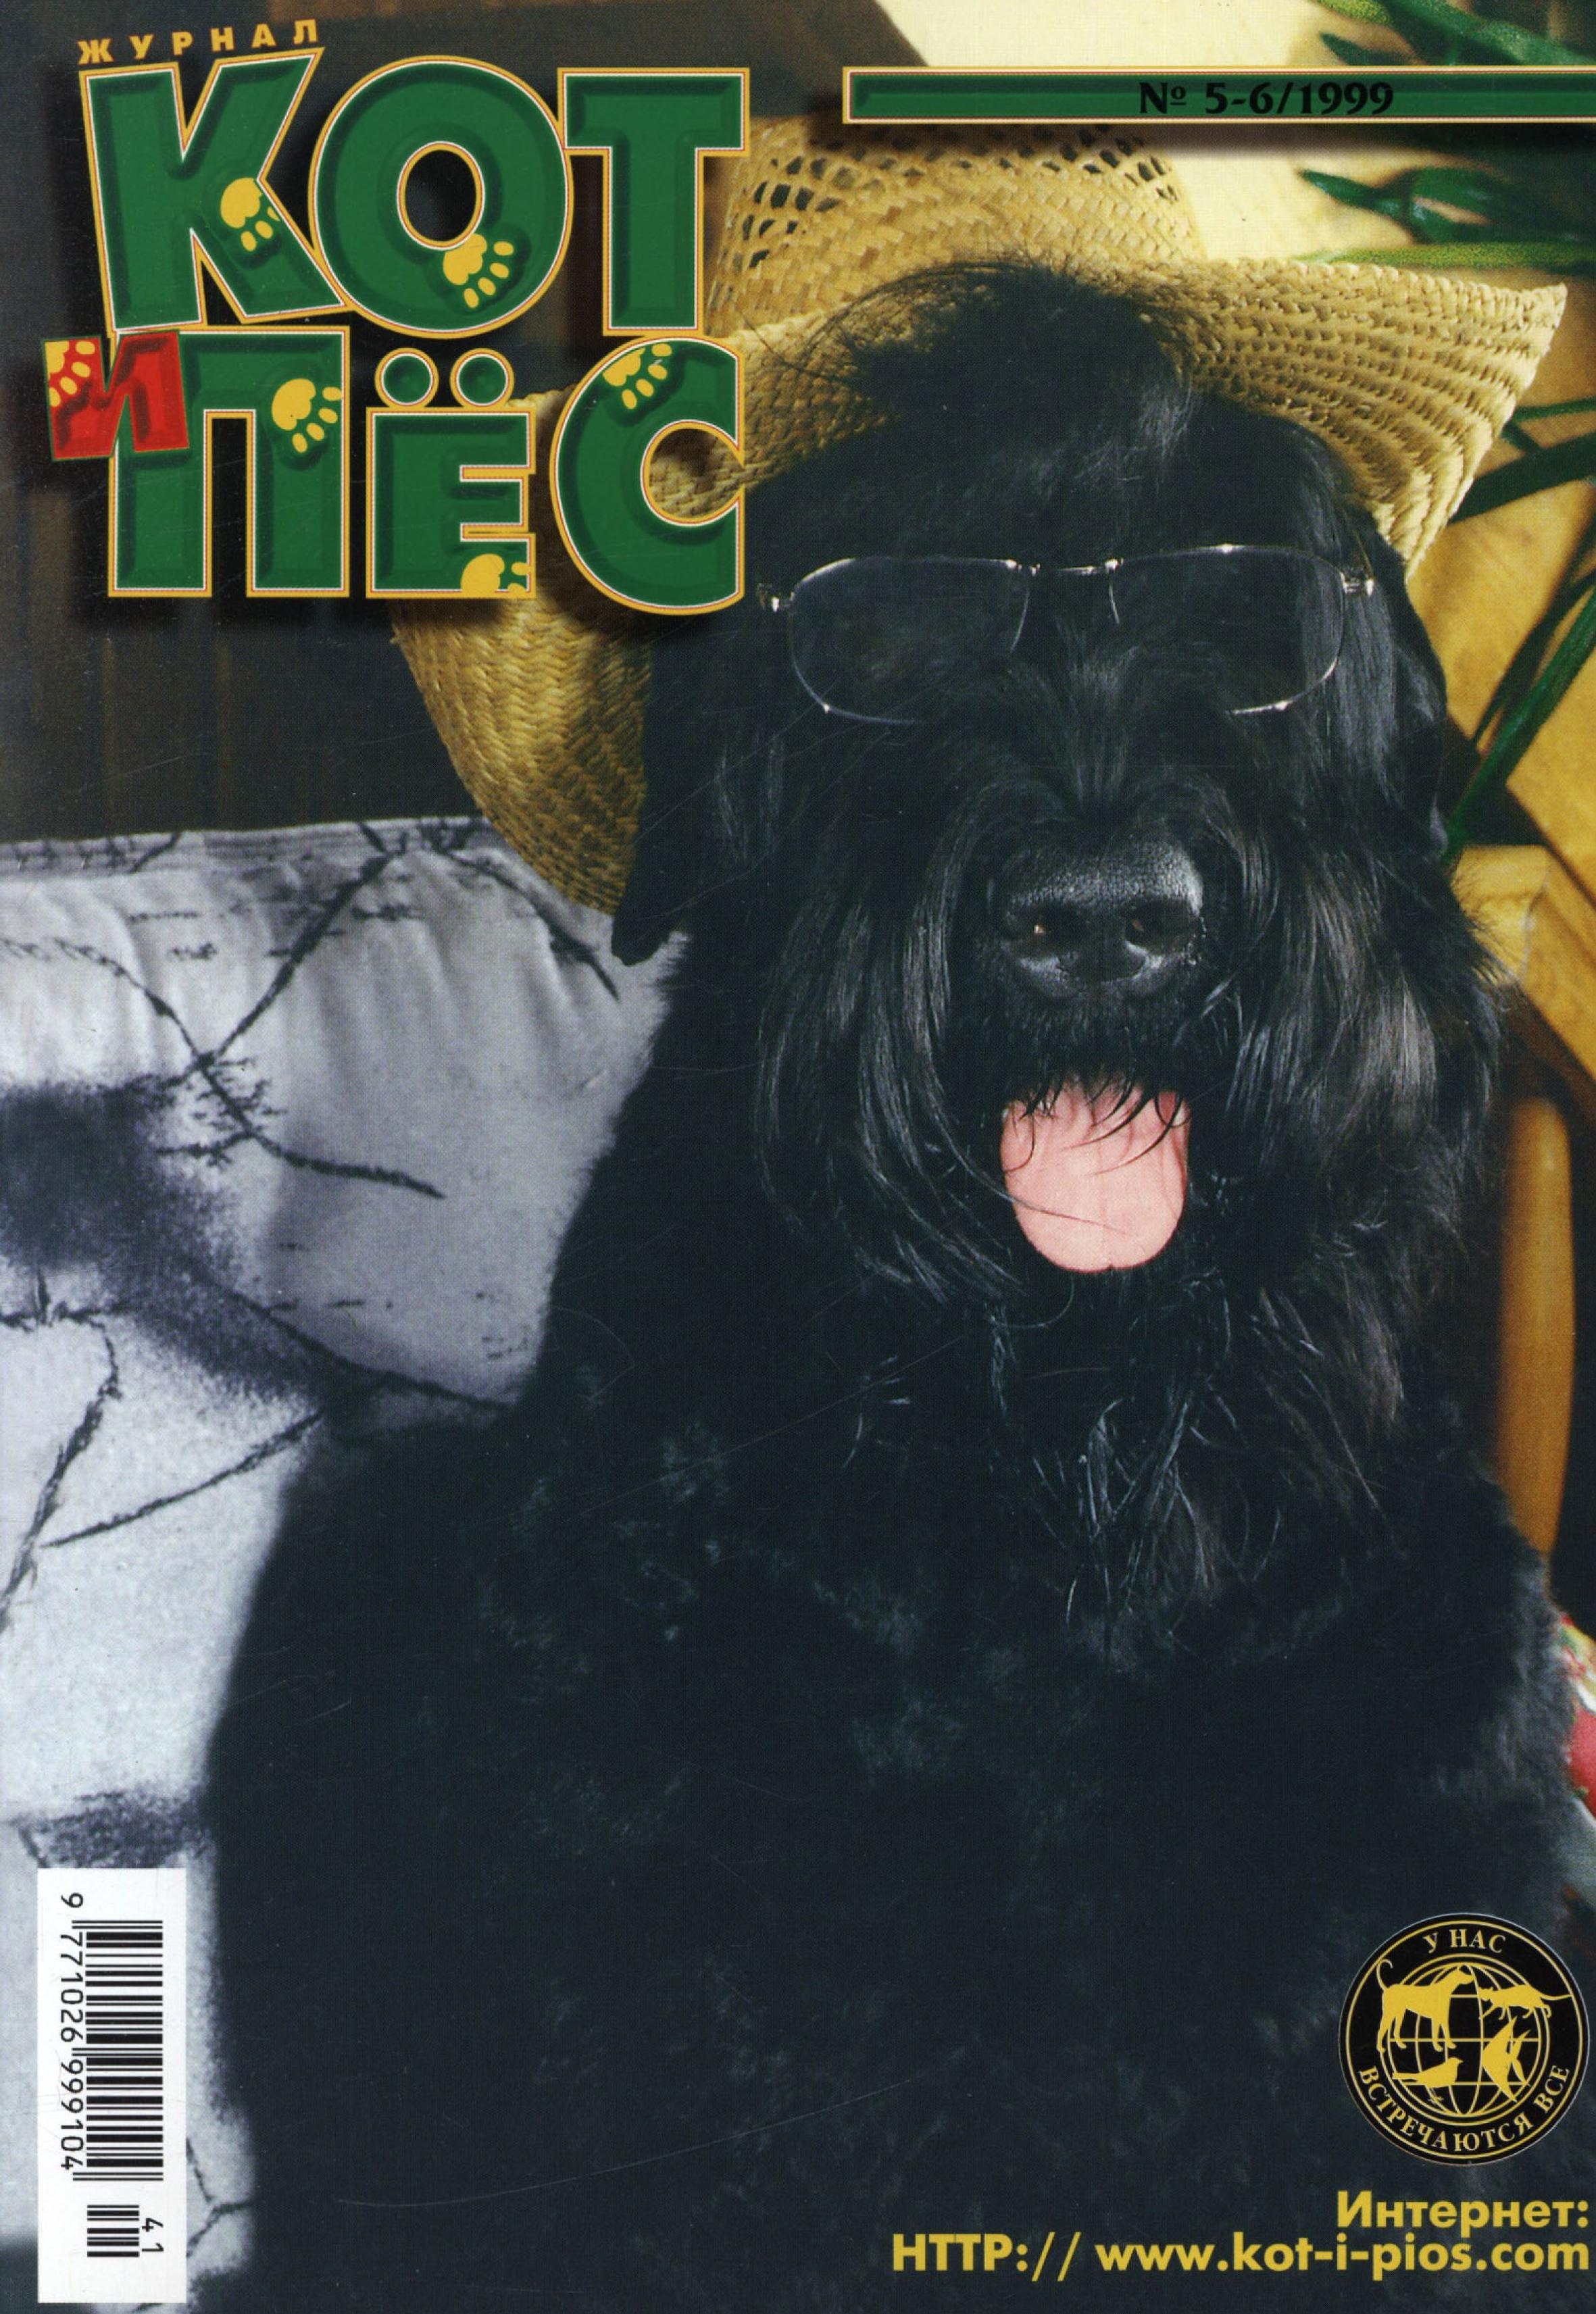 Кот и Пёс №05-06/1999